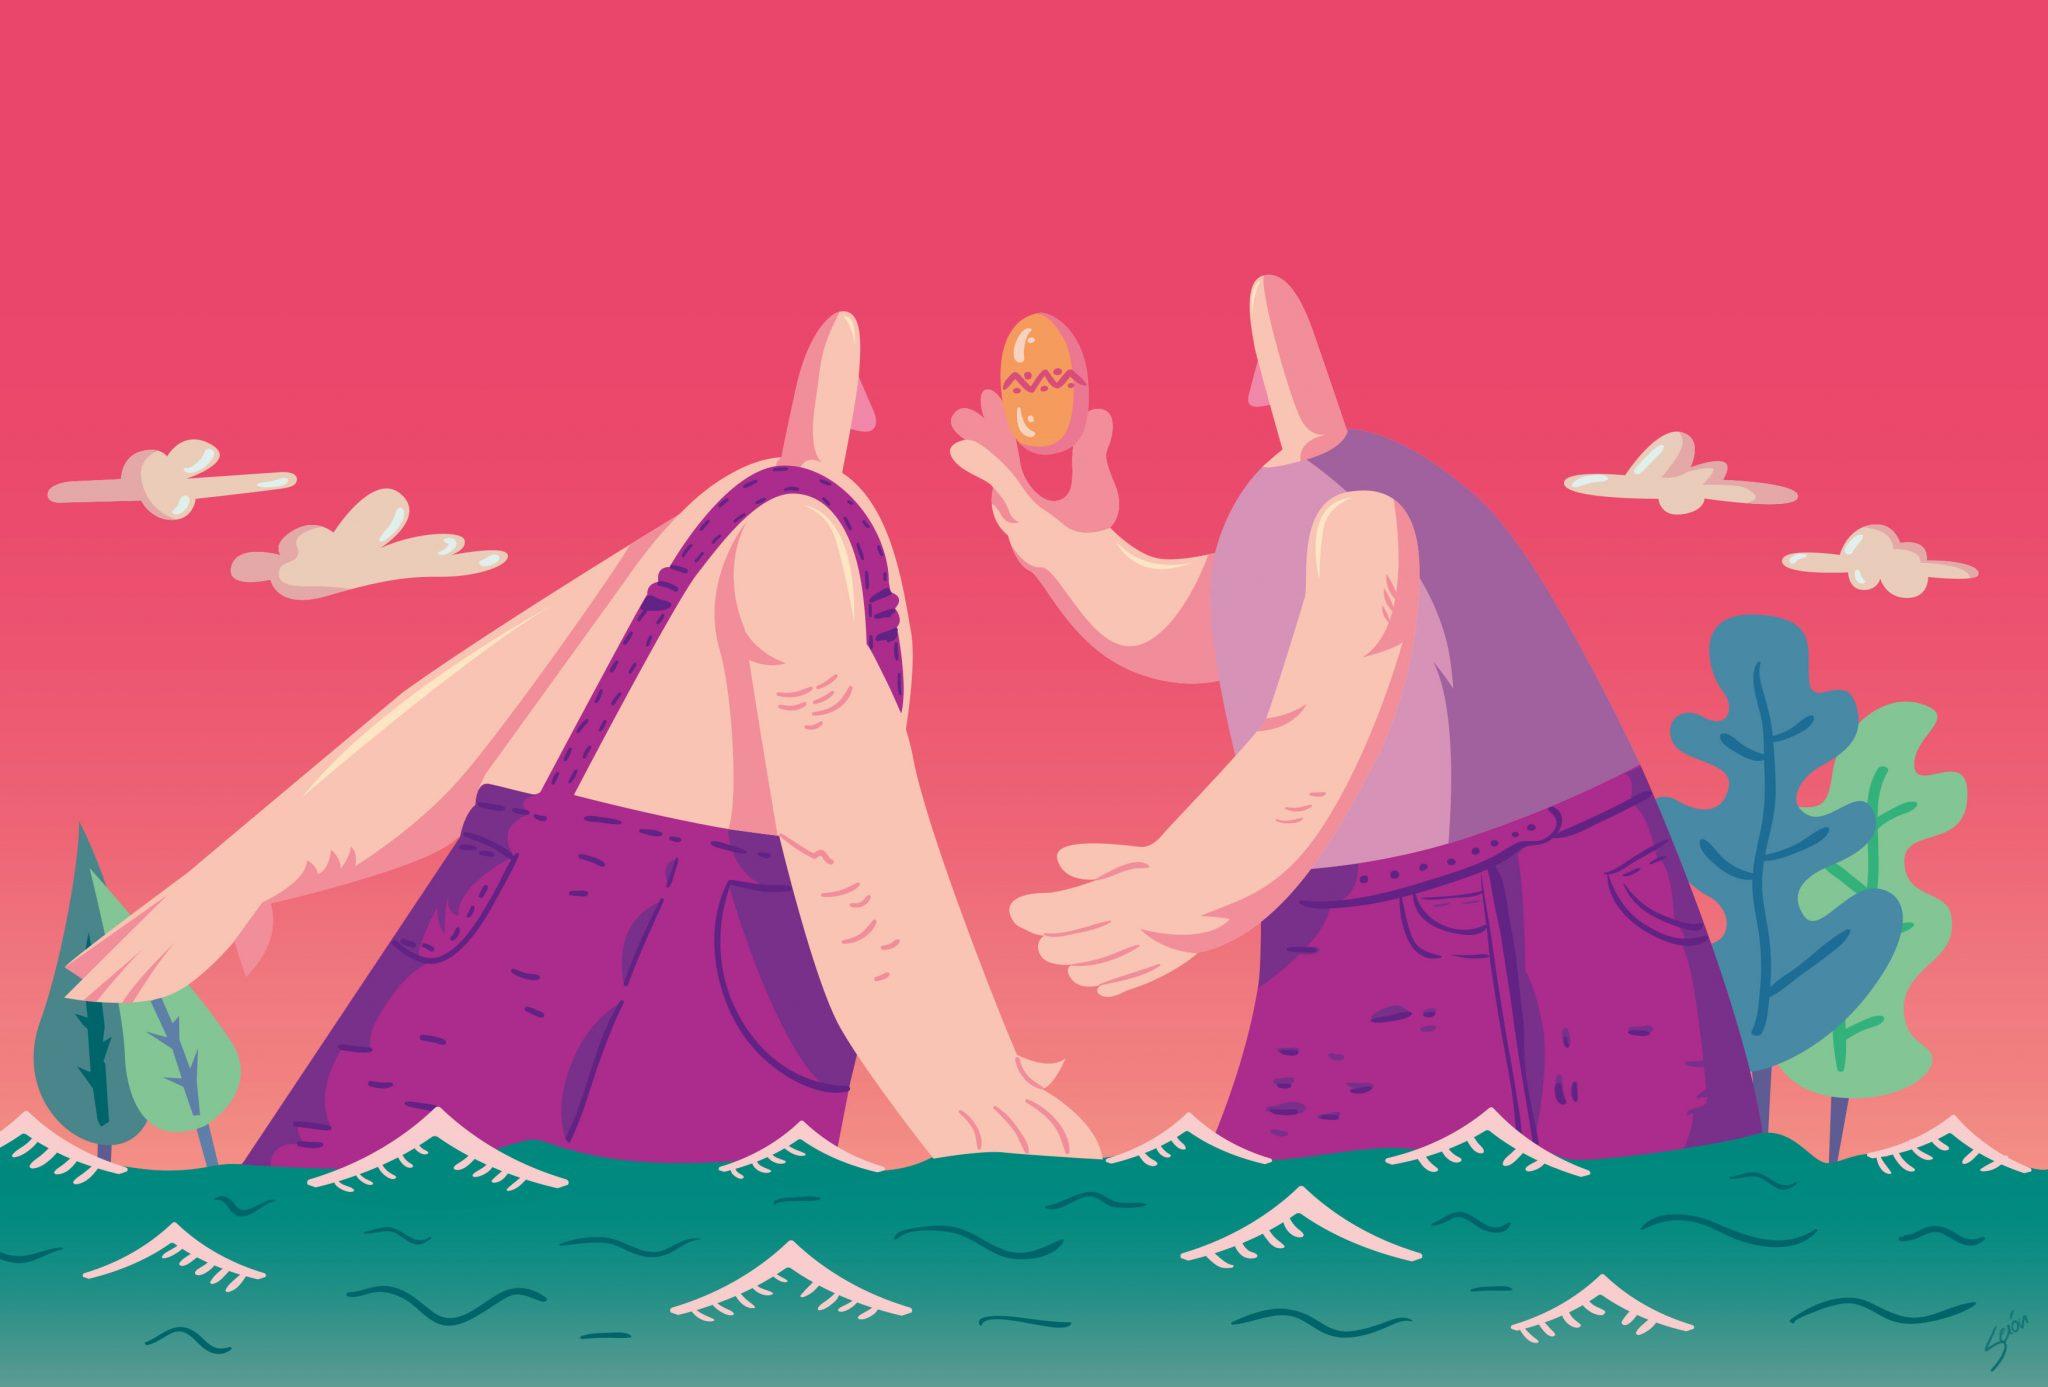 Ilustracion editorial gigantes